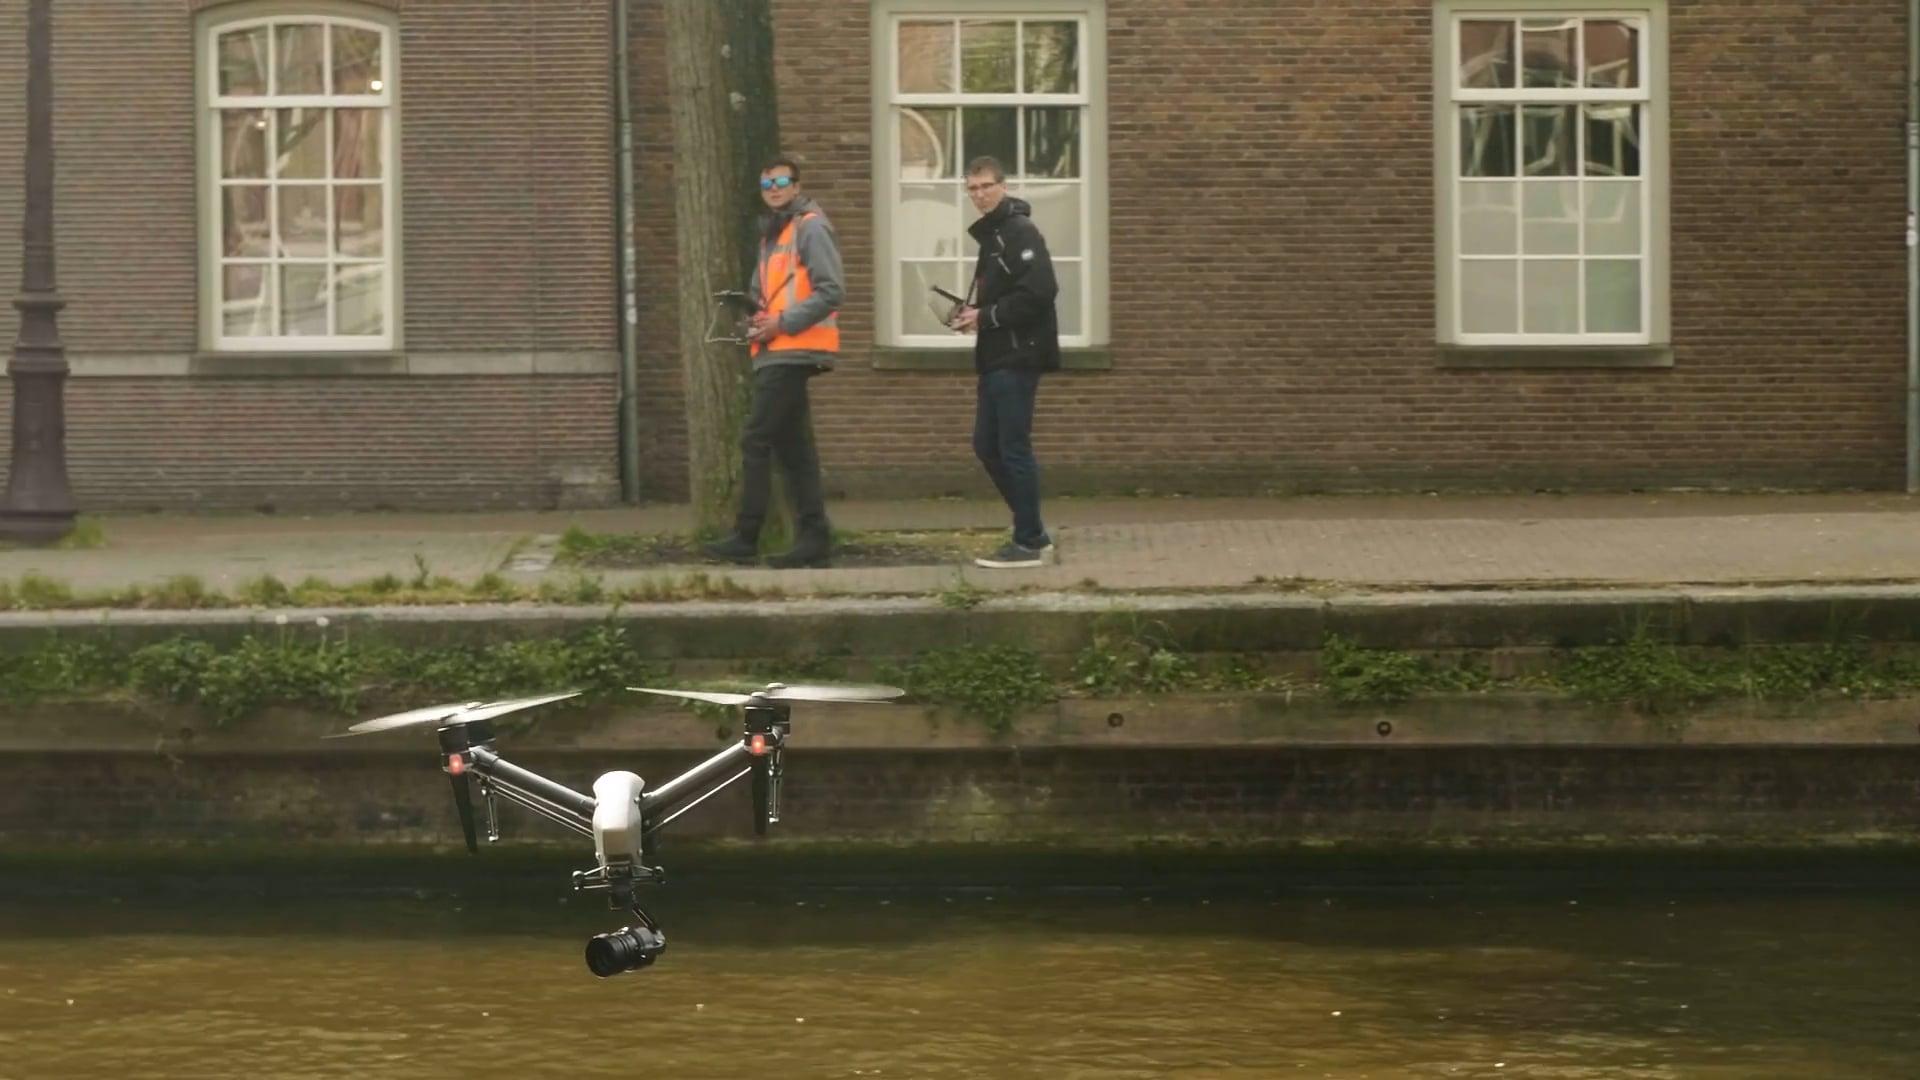 Antea Group - Drone Kademetingen Fotogrammetrie